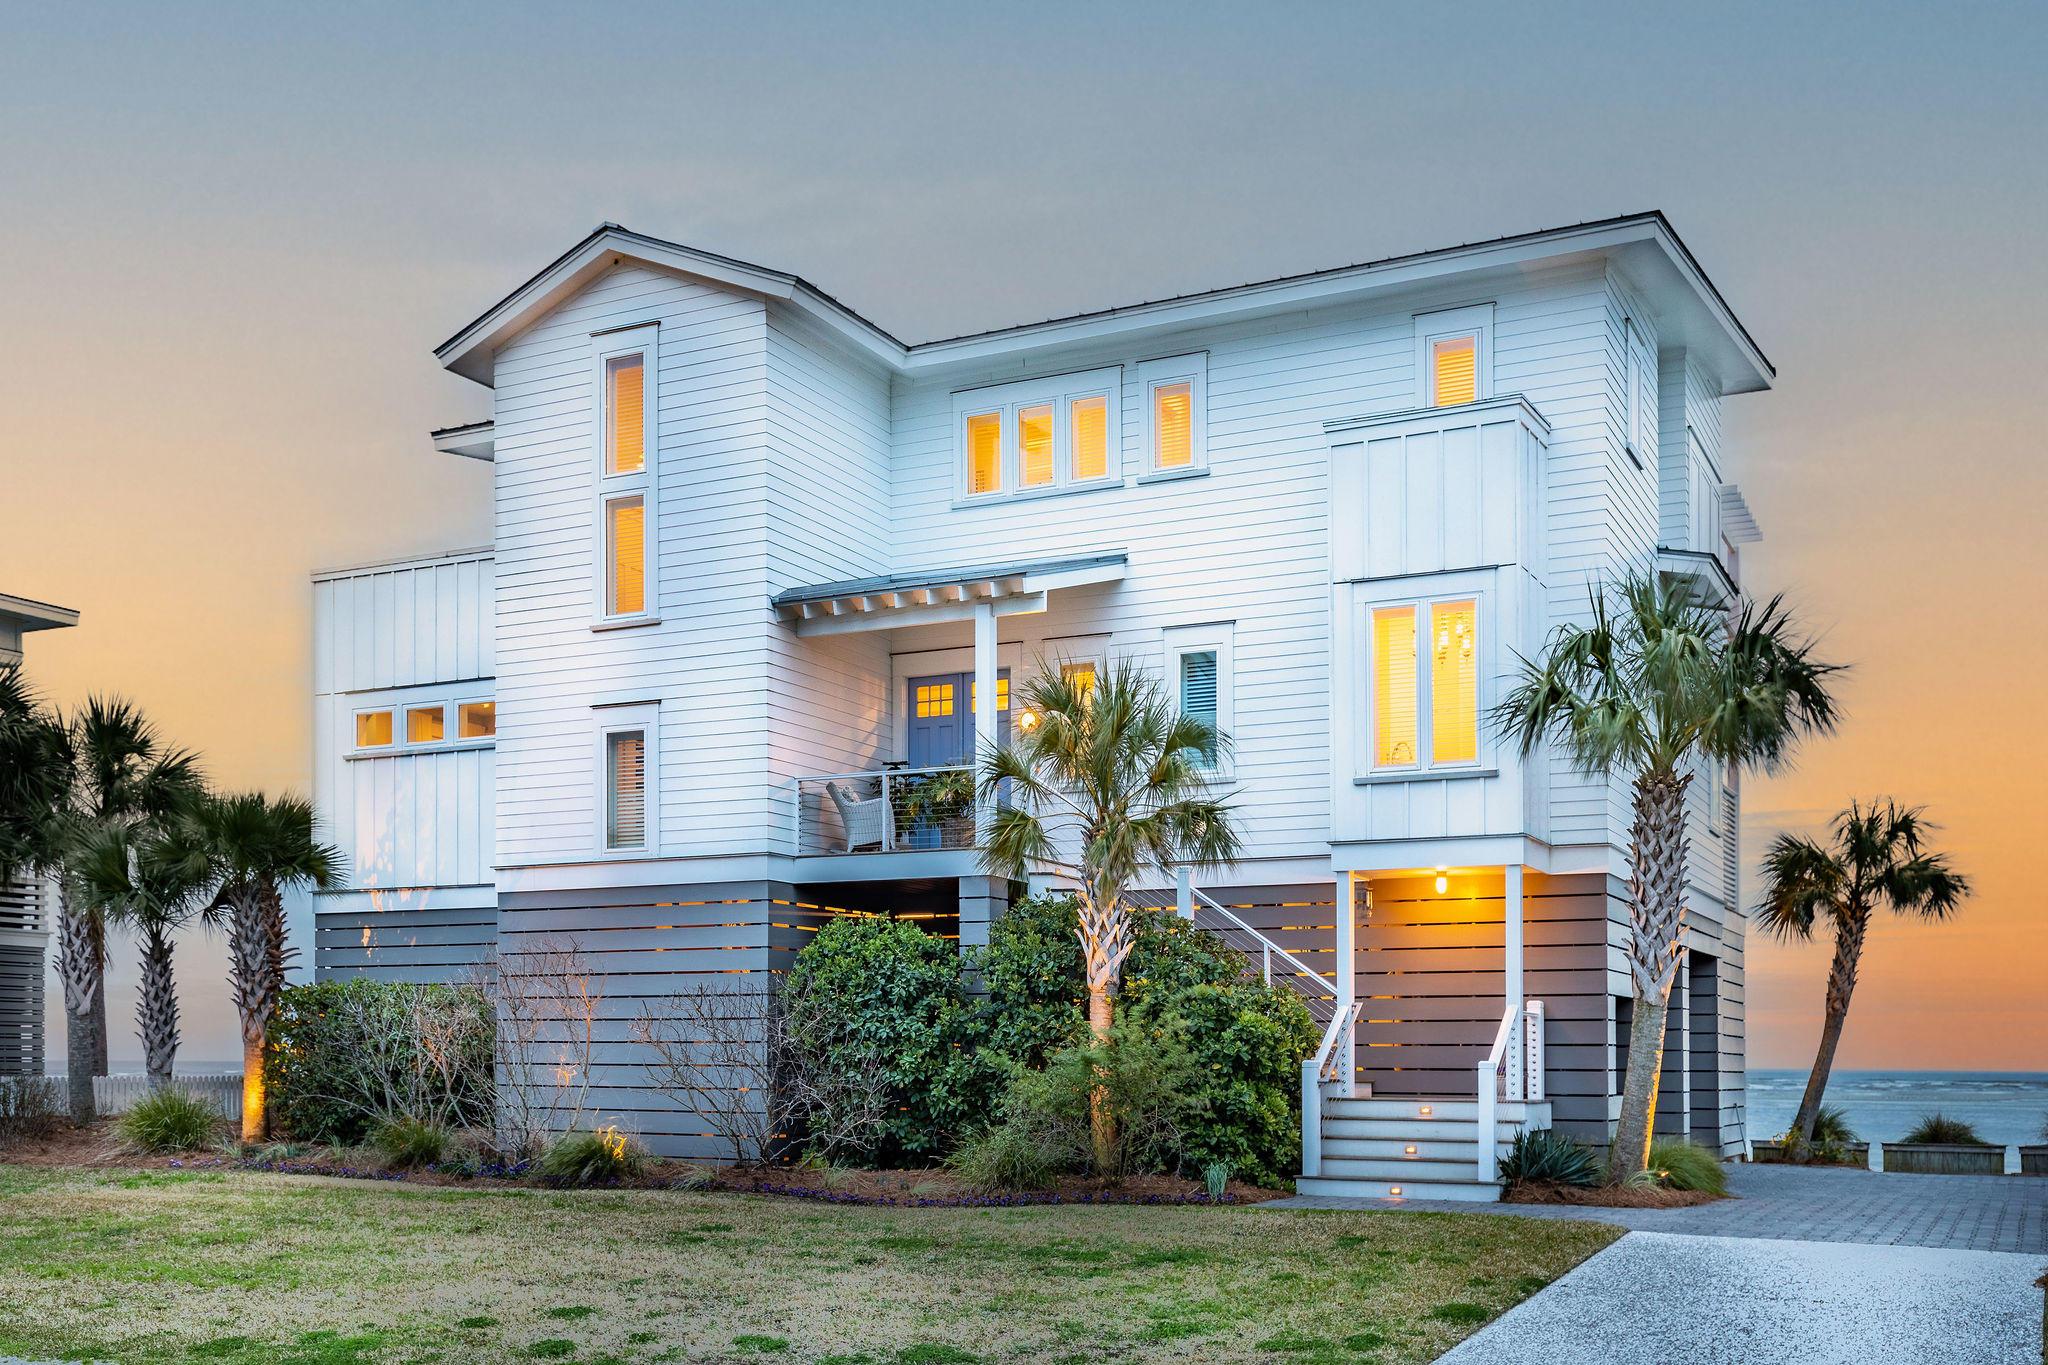 3013 Marshall Boulevard, Sullivans Island, 29482, 4 Bedrooms Bedrooms, ,4 BathroomsBathrooms,Residential,For Sale,Marshall,21010234